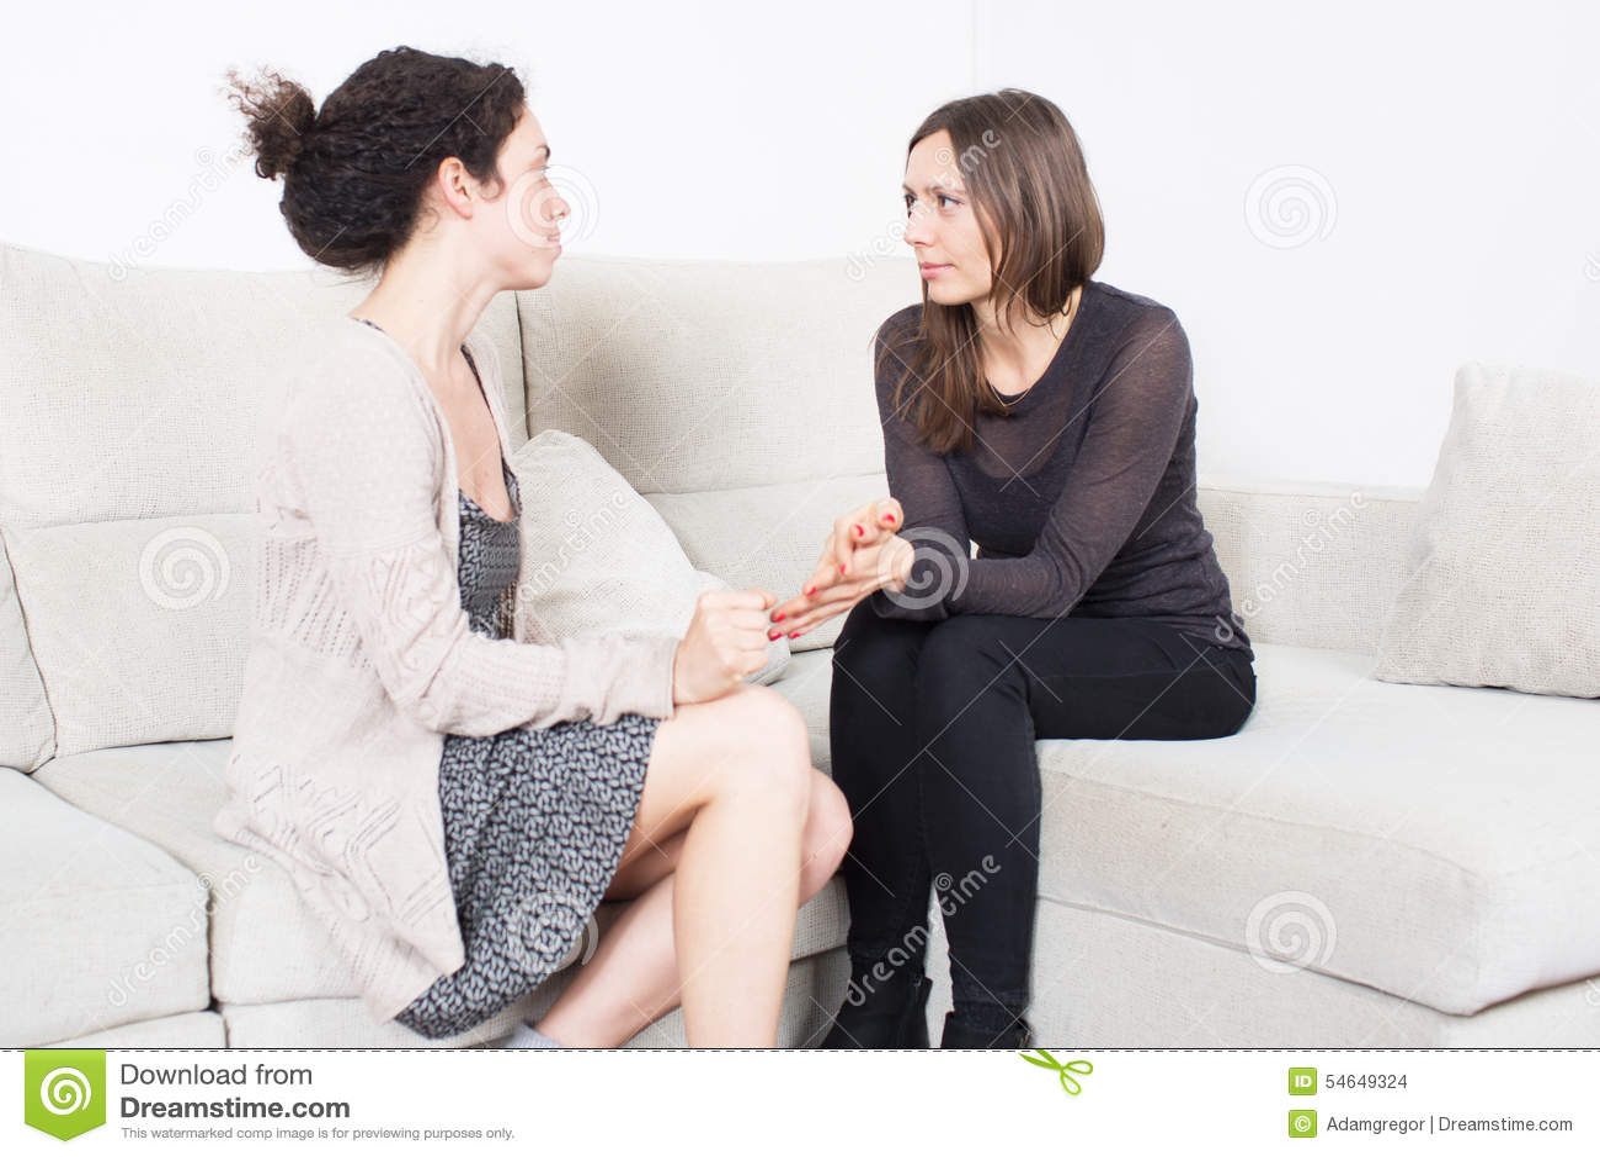 Two women pics 37